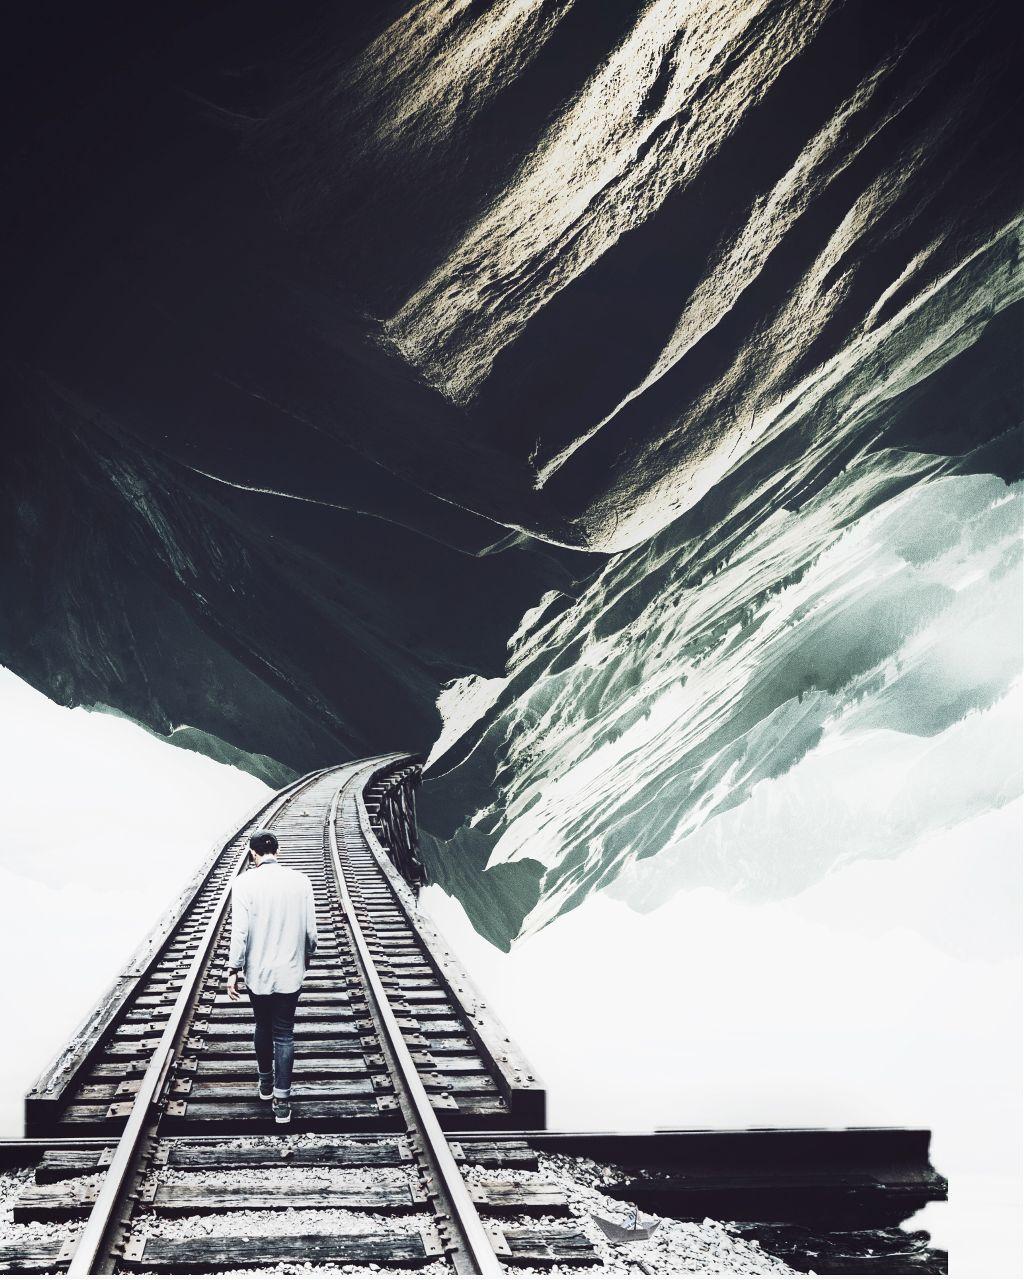 #freshstart #newtrails #tracks #walking #surreal #book #traveling